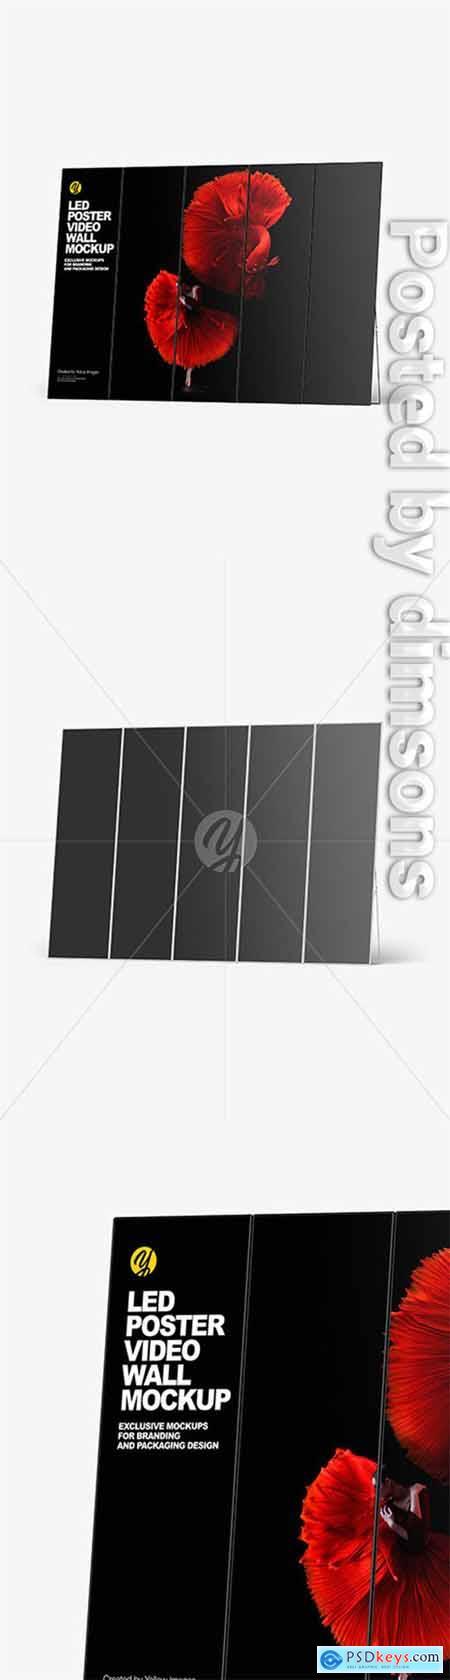 LED Poster Video Wall Mockup 51245